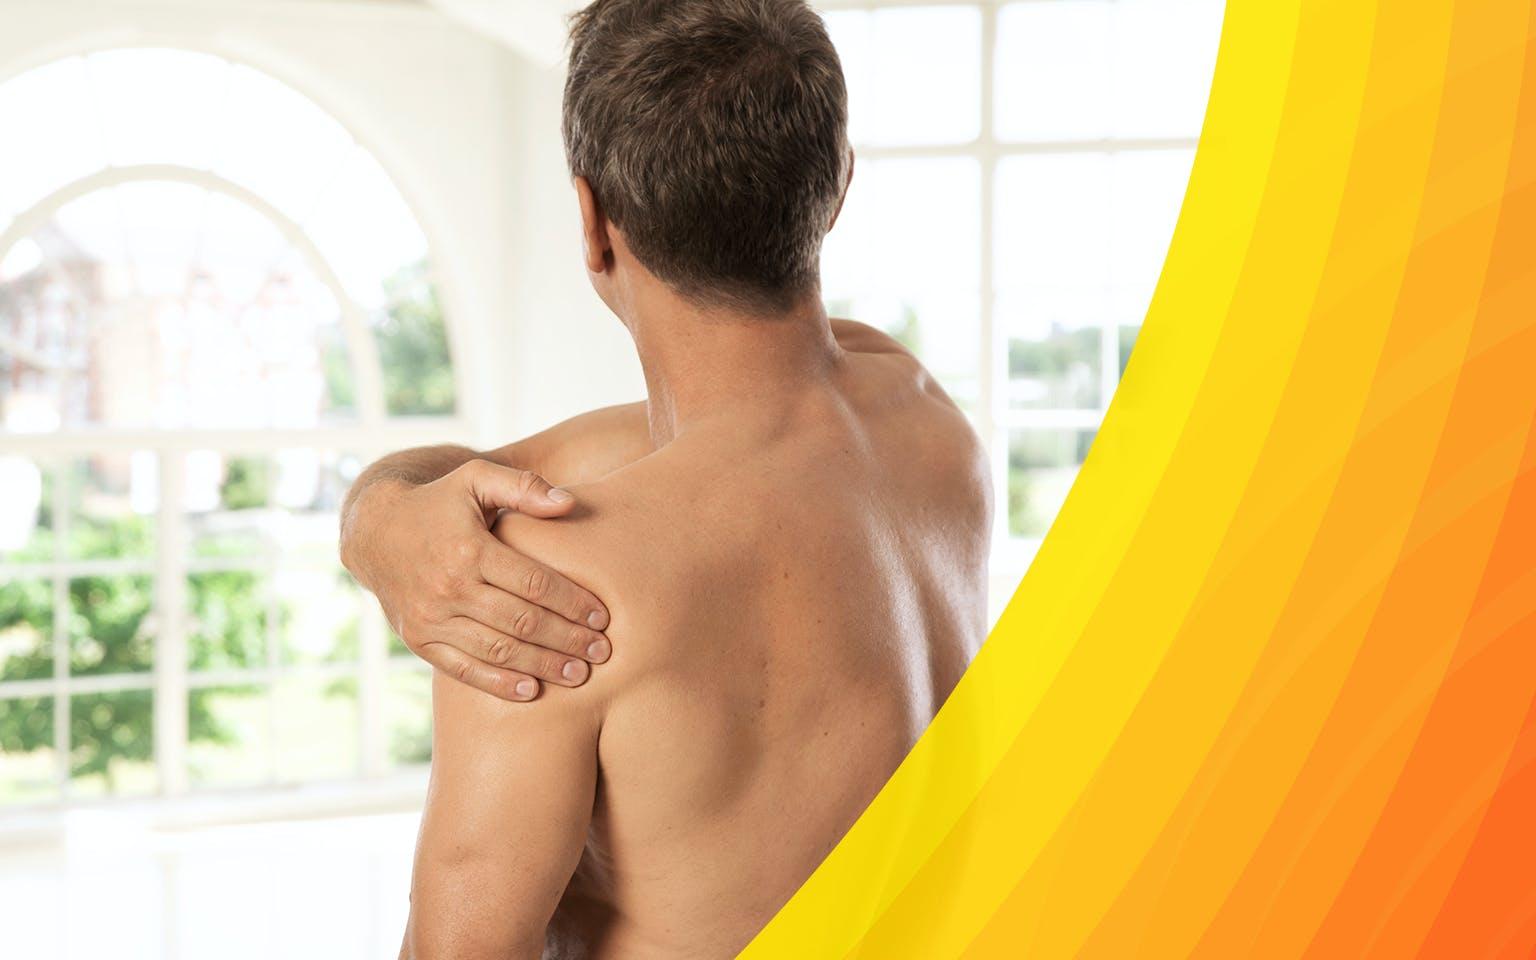 Shirtless man holding his shoulder because of shoulder pain